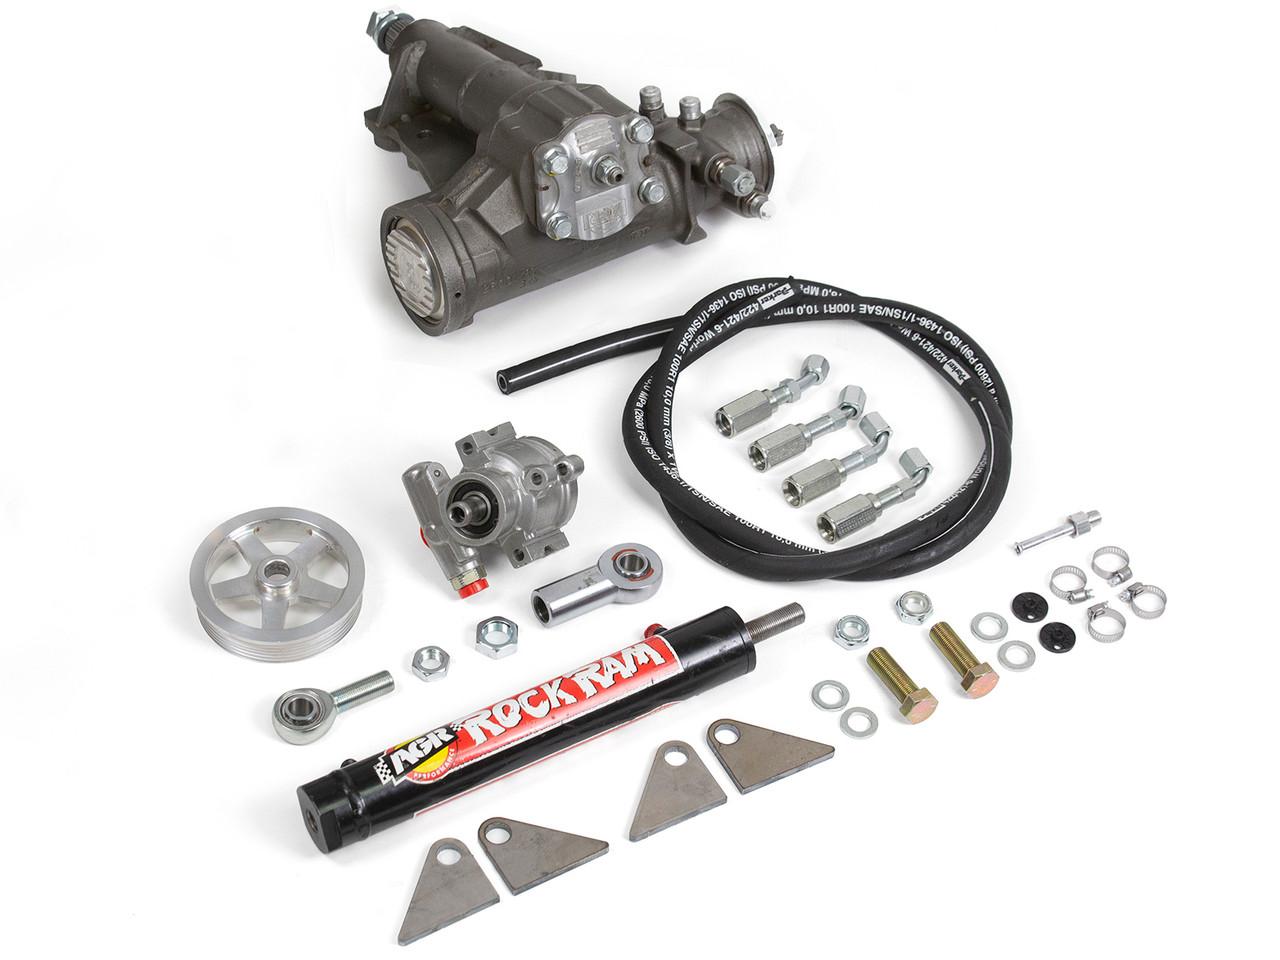 AGR Rock Ram Steering System for Jeep Wrangler JK